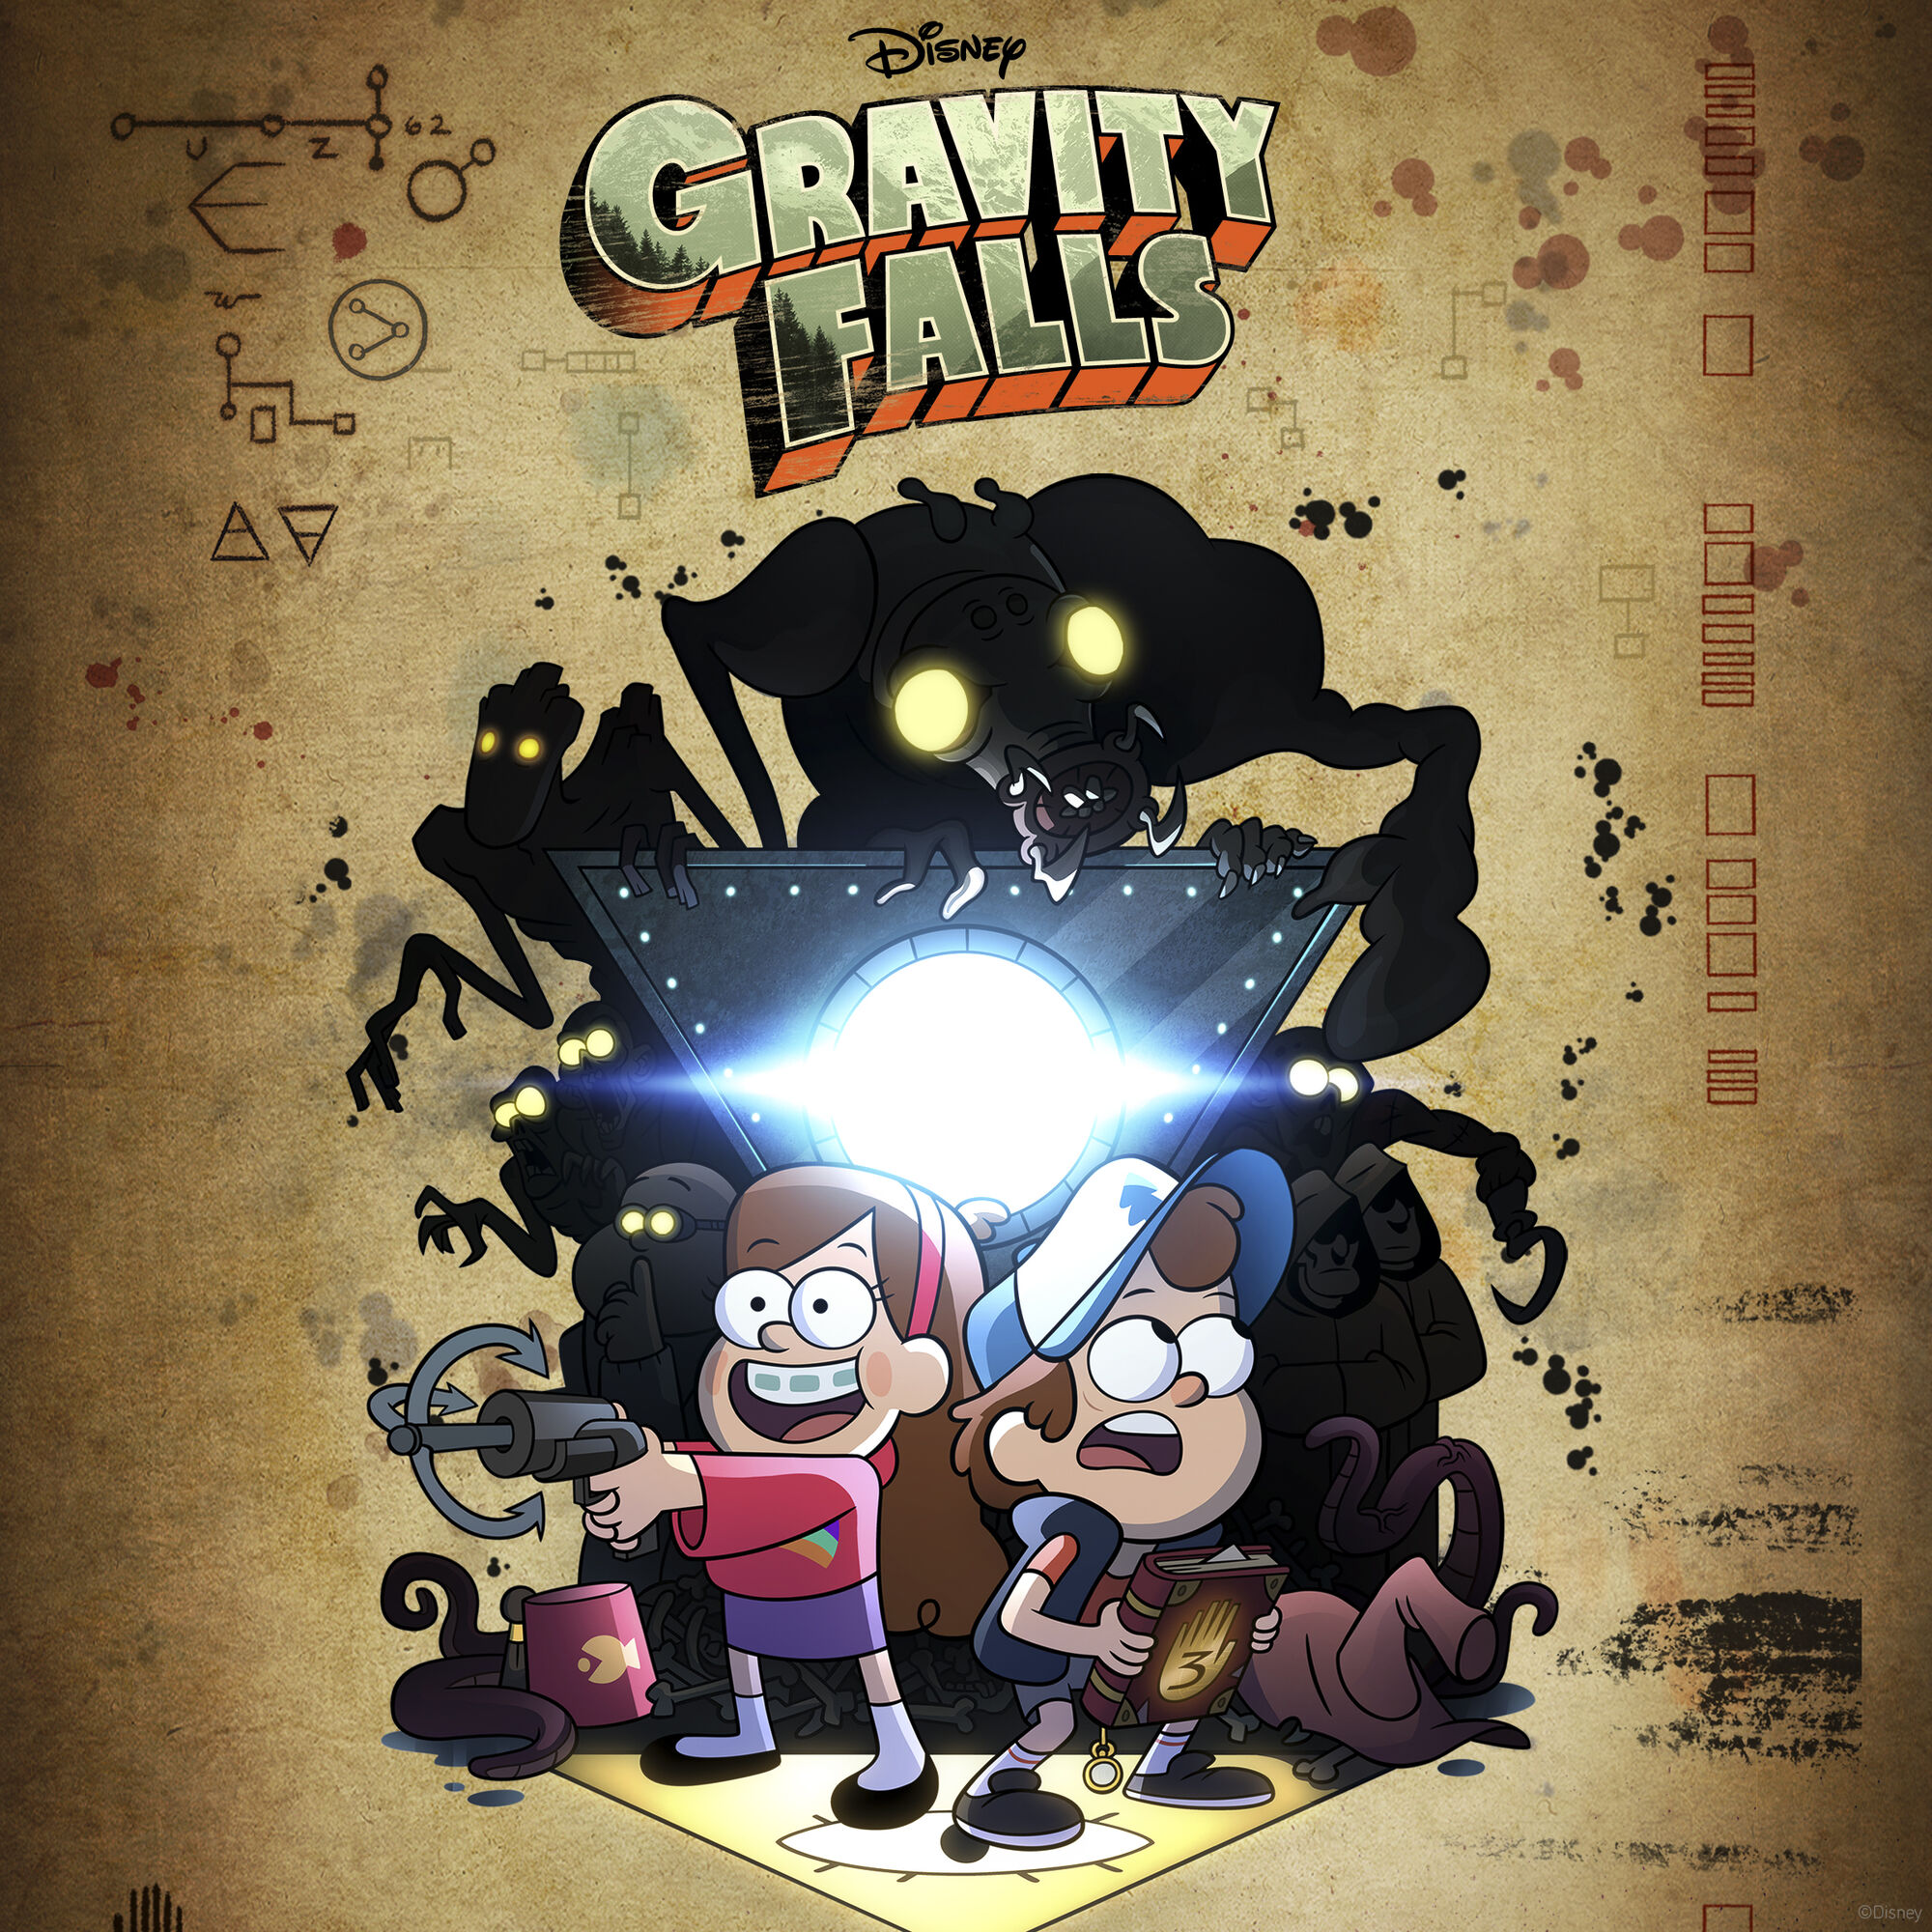 gravity falls website card season 1 - All Ages of Geek